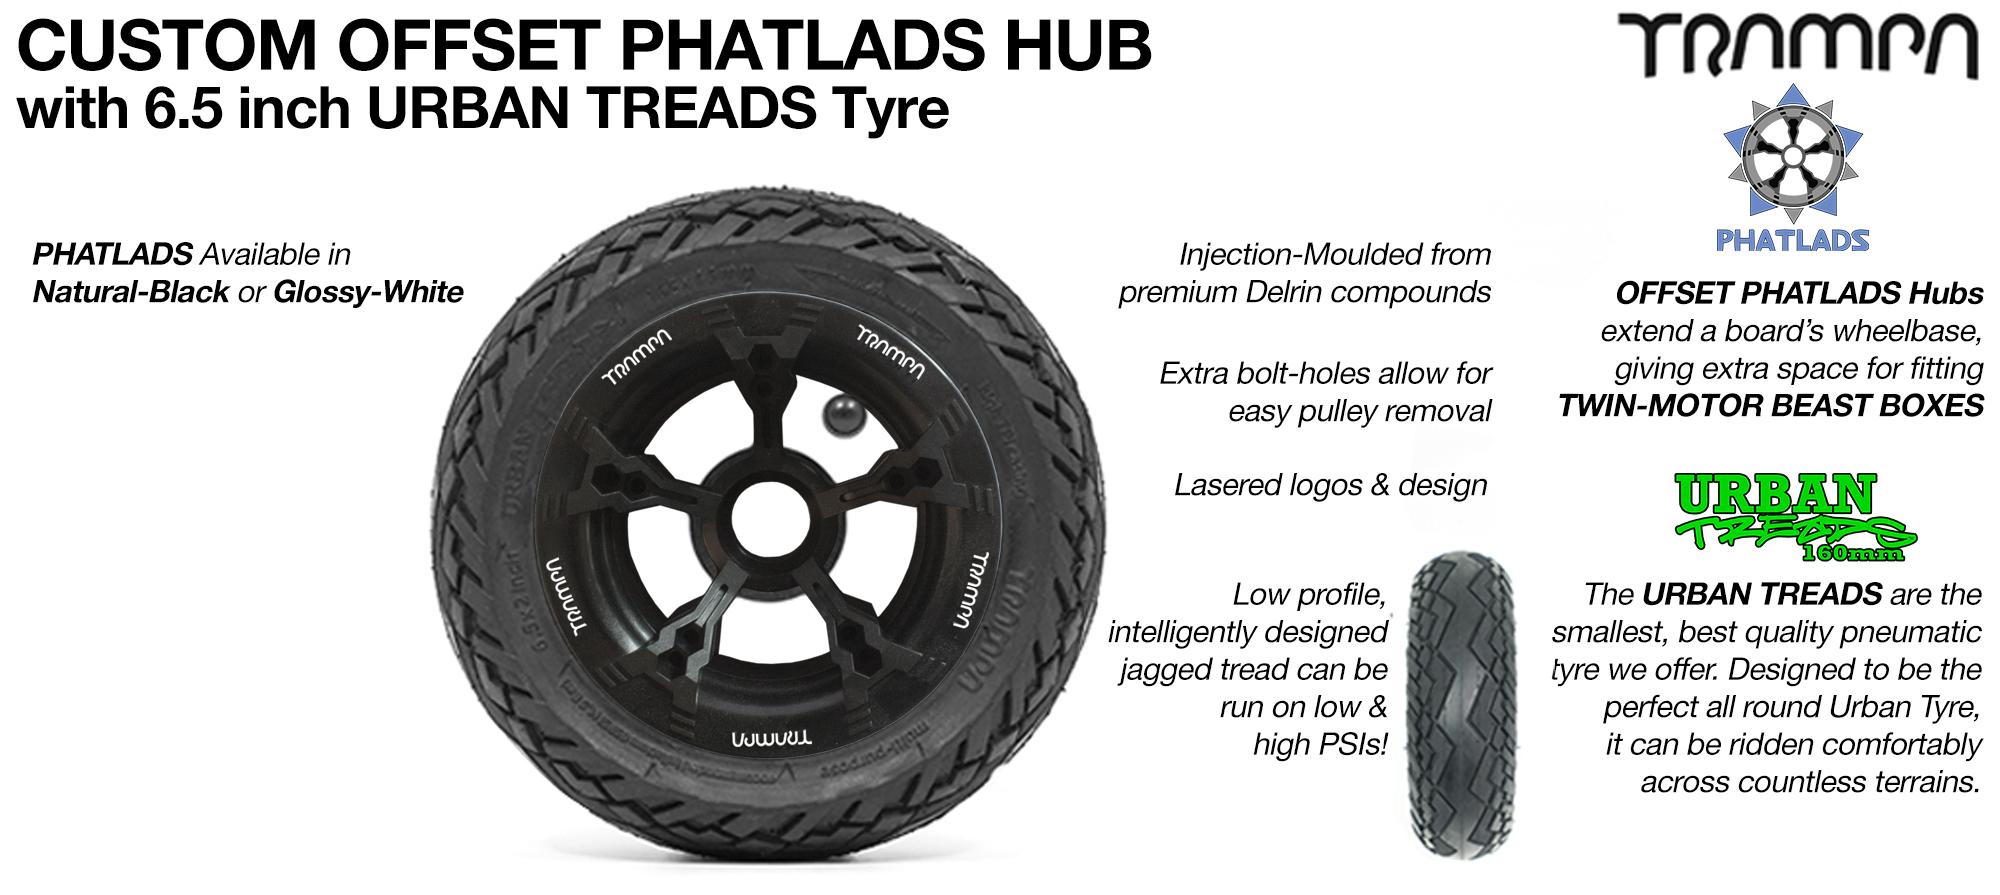 PHATLADZ Deepdish hub with 6.5 Inch Low Profile URBAN Treads Tyres